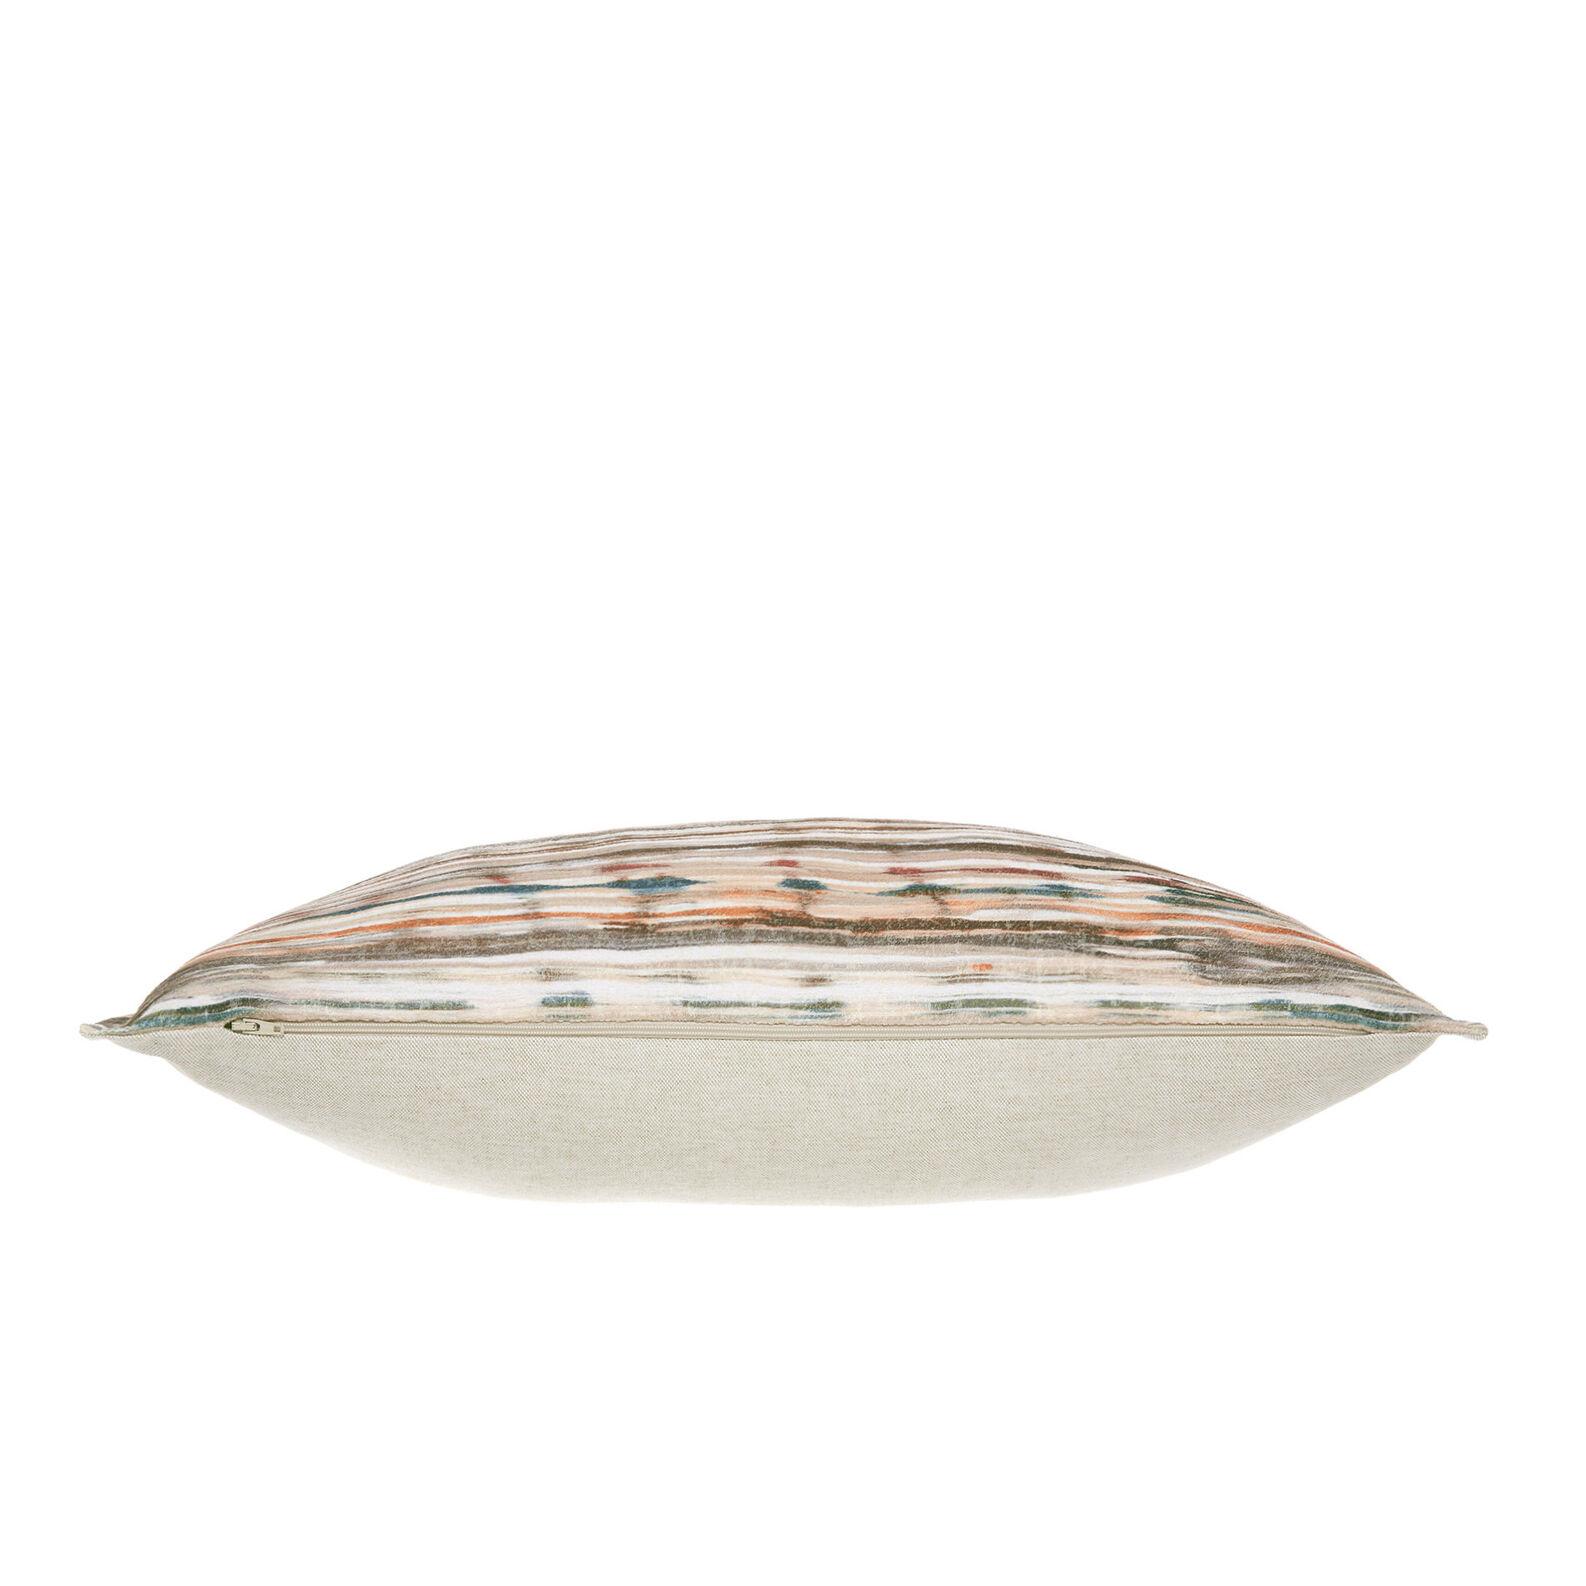 Peach fuzz-effect cushion with striped design 35x55cm